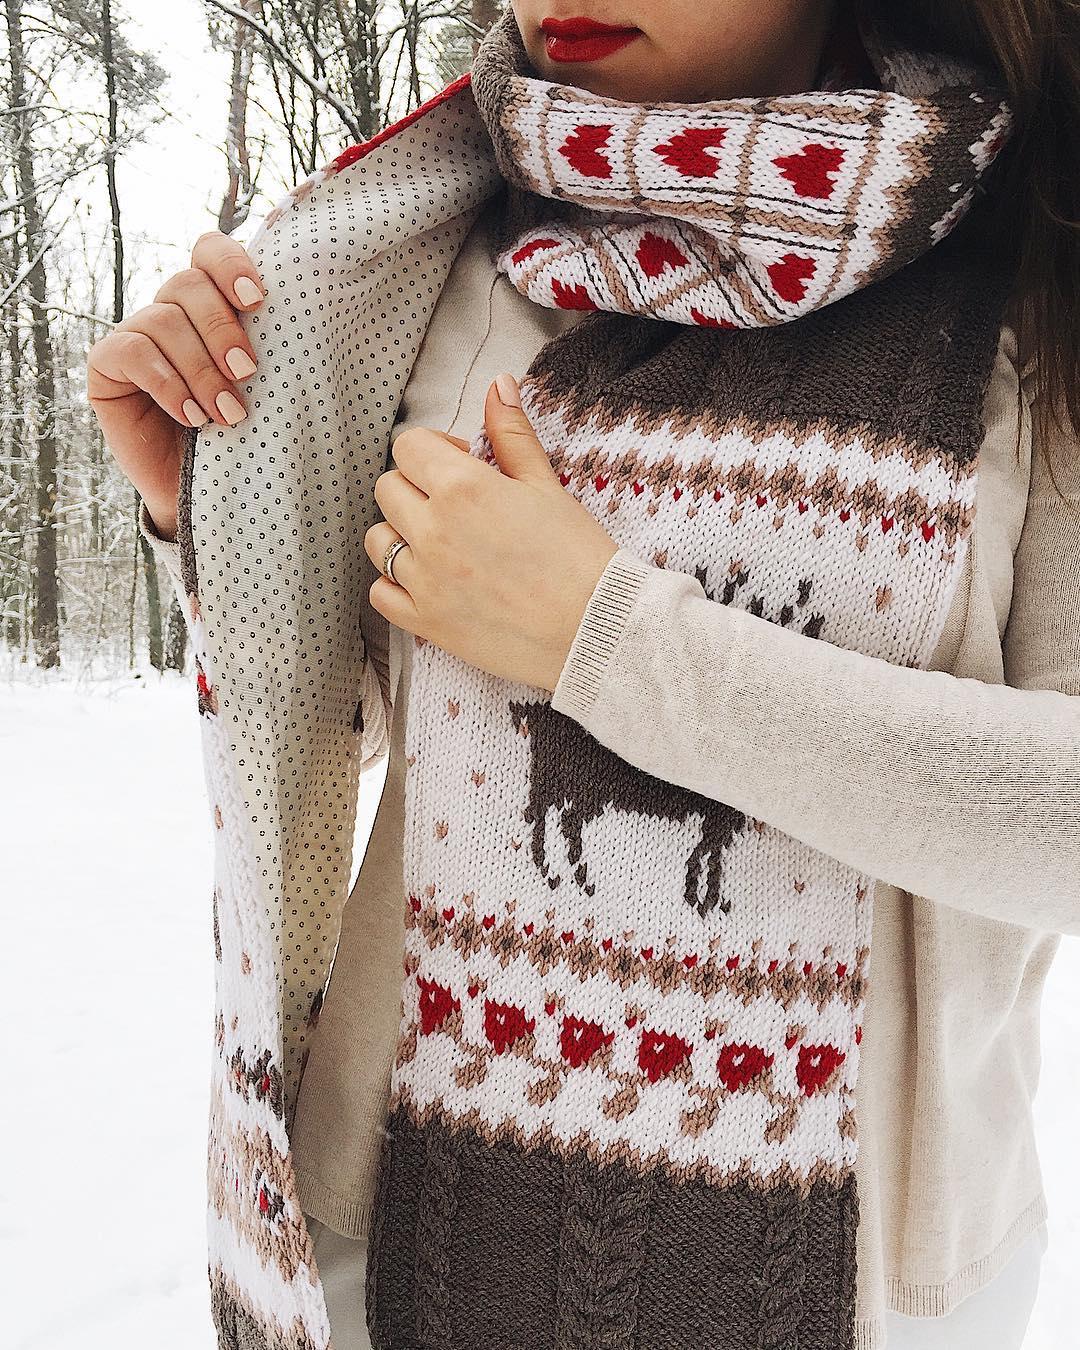 30-free-crochet-afghan-padrao-petalas-de-queda-afegaos